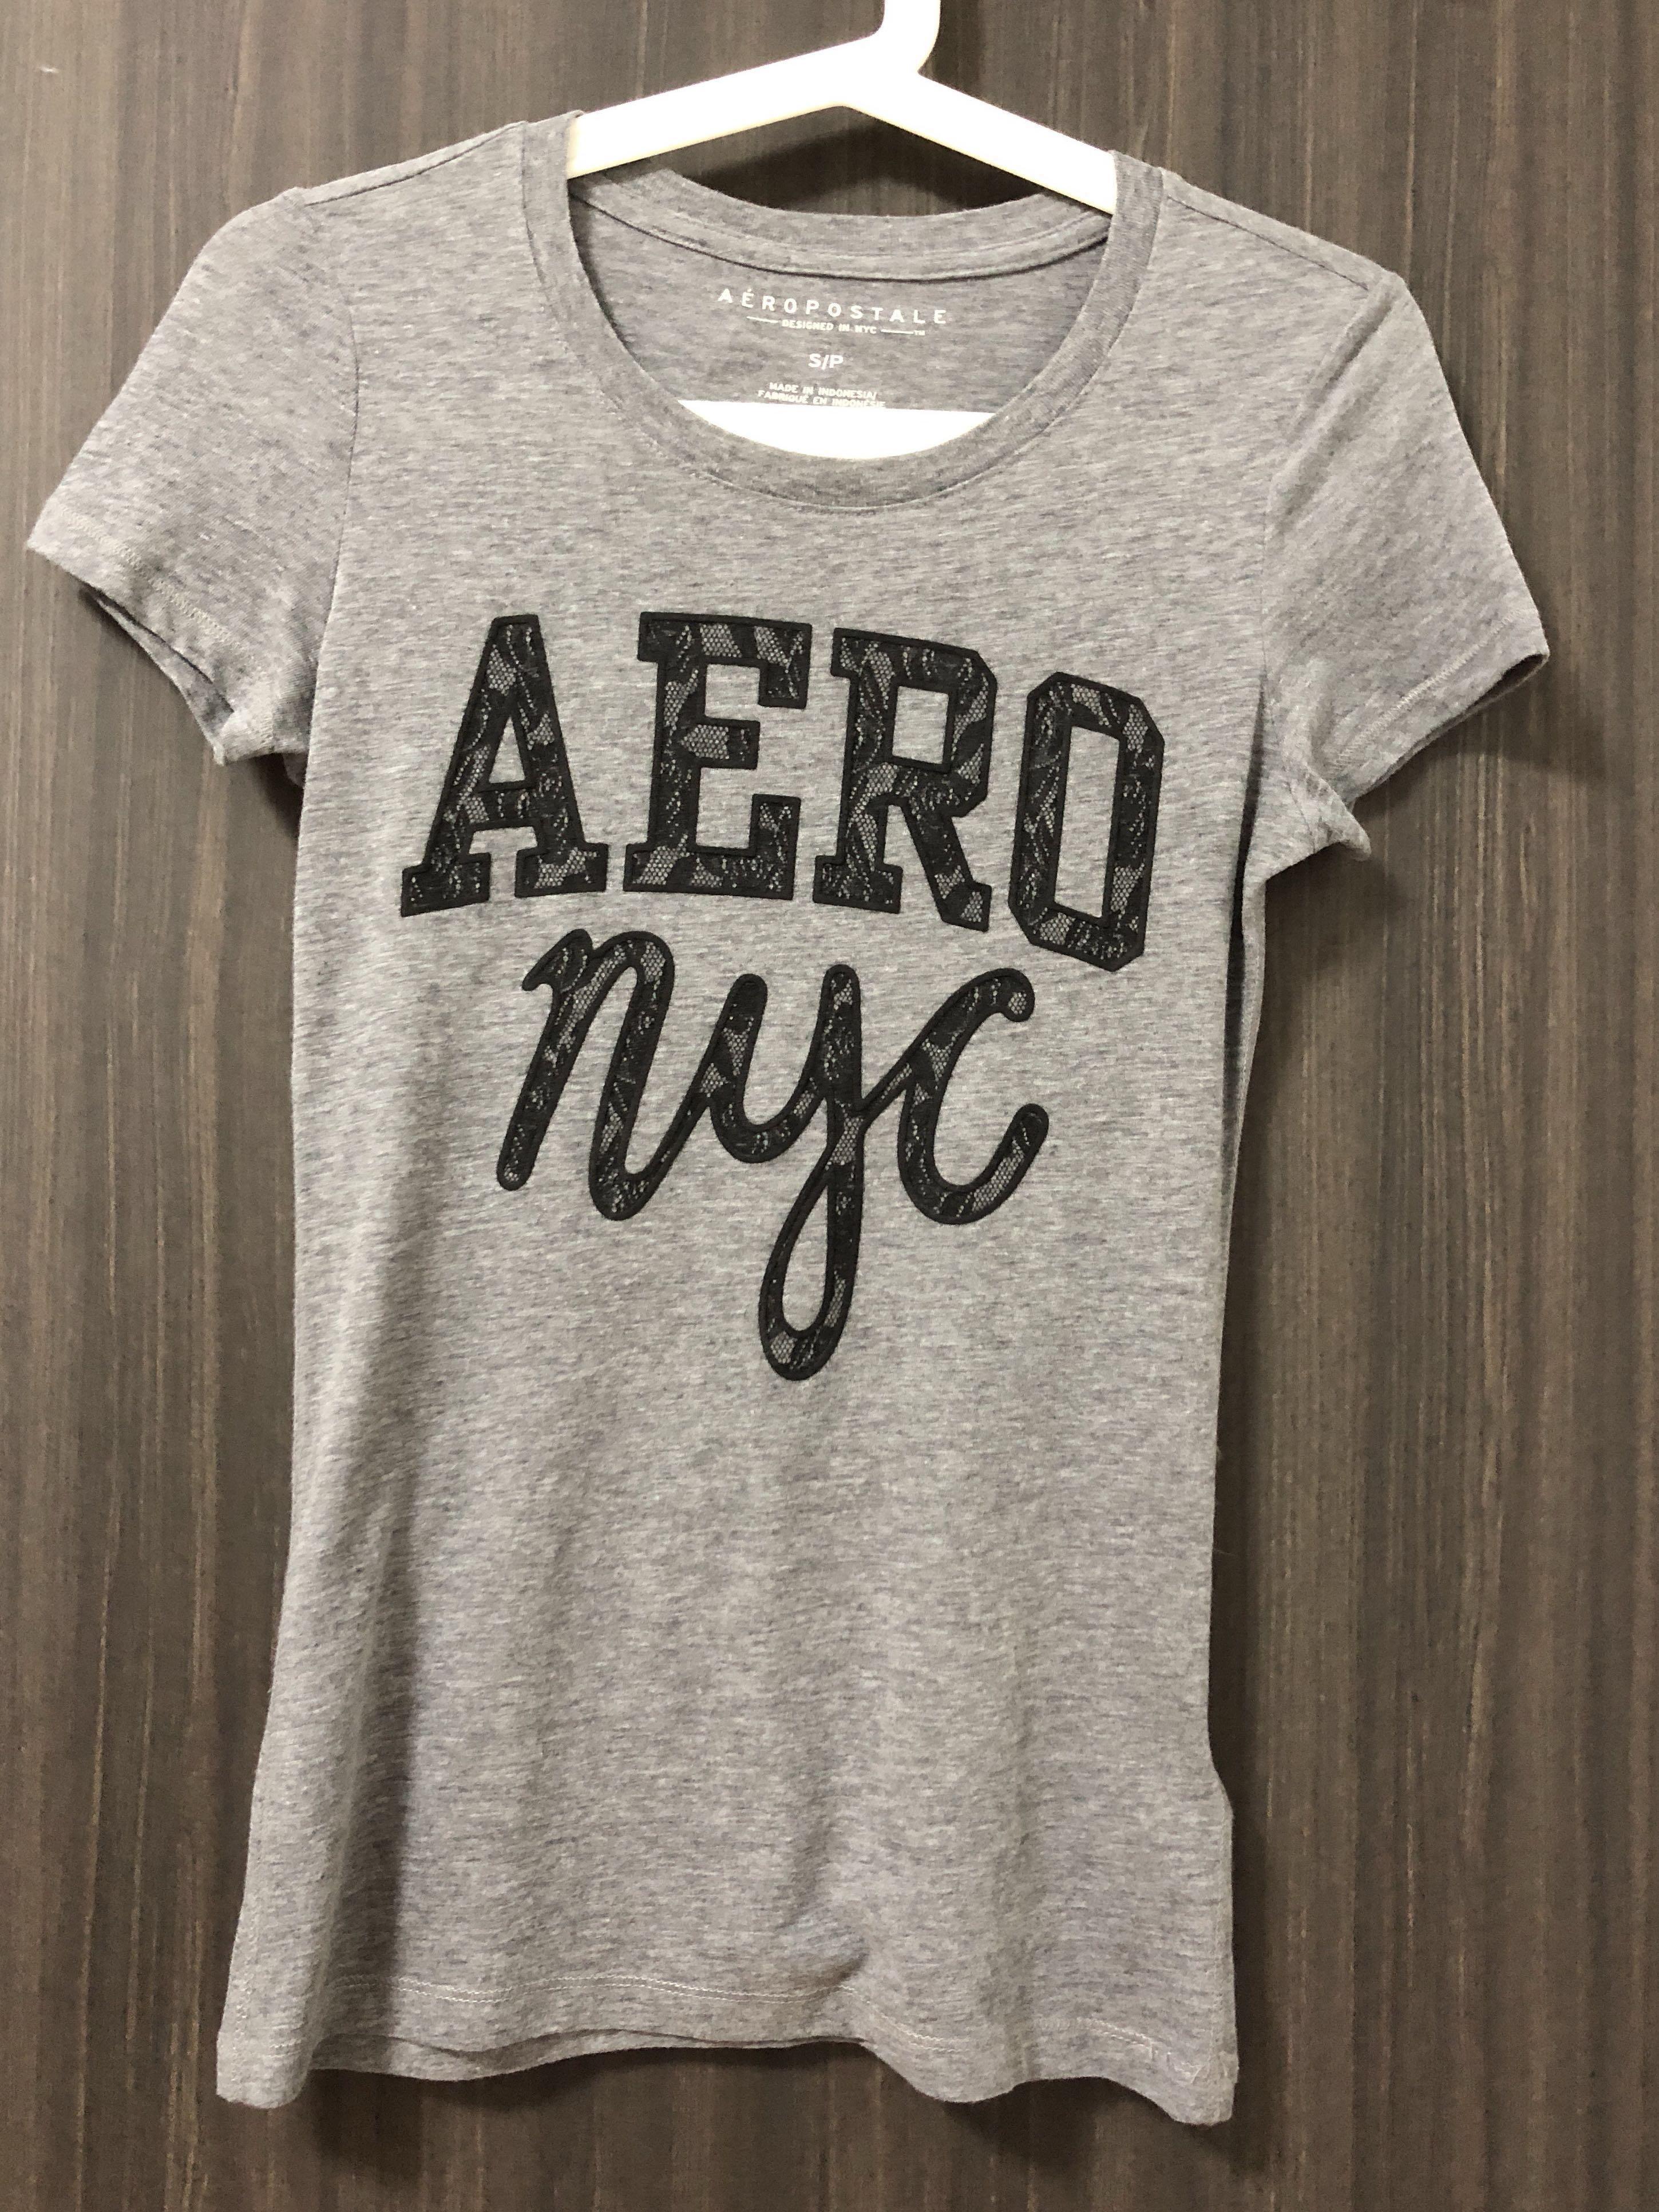 1dc4d2d79d1ca8 BN Aeropostale nyc Lace Wordings Tee in Grey, Women's Fashion ...